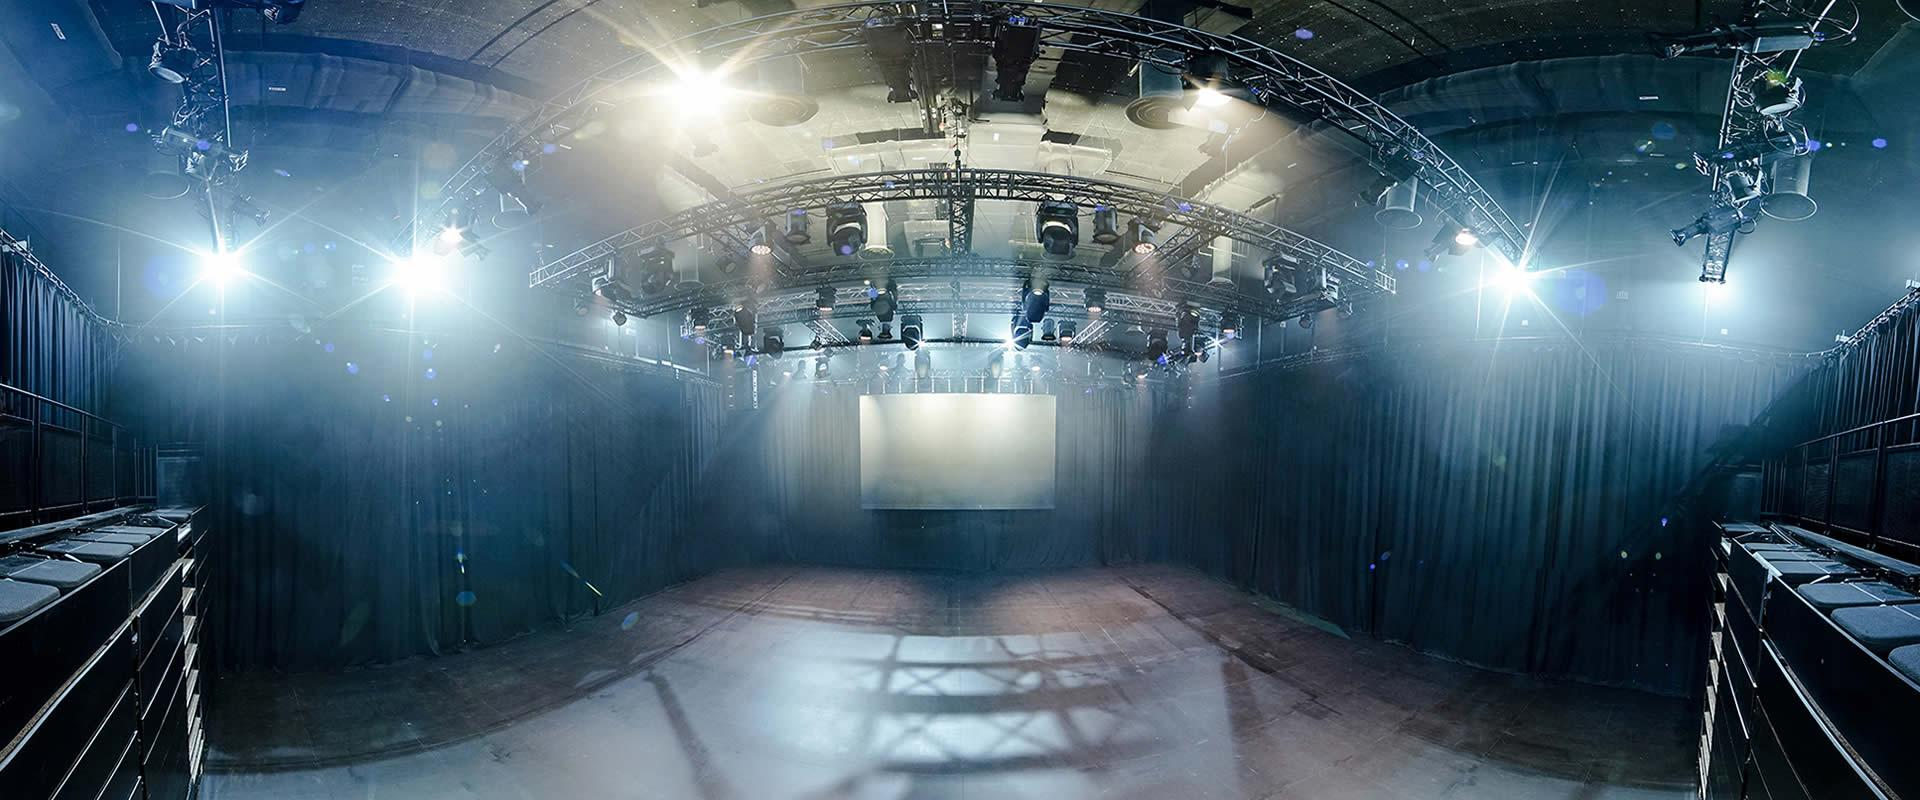 Home / Spaces / Blackbox. 1 & Blackbox | Gateway Theatre azcodes.com